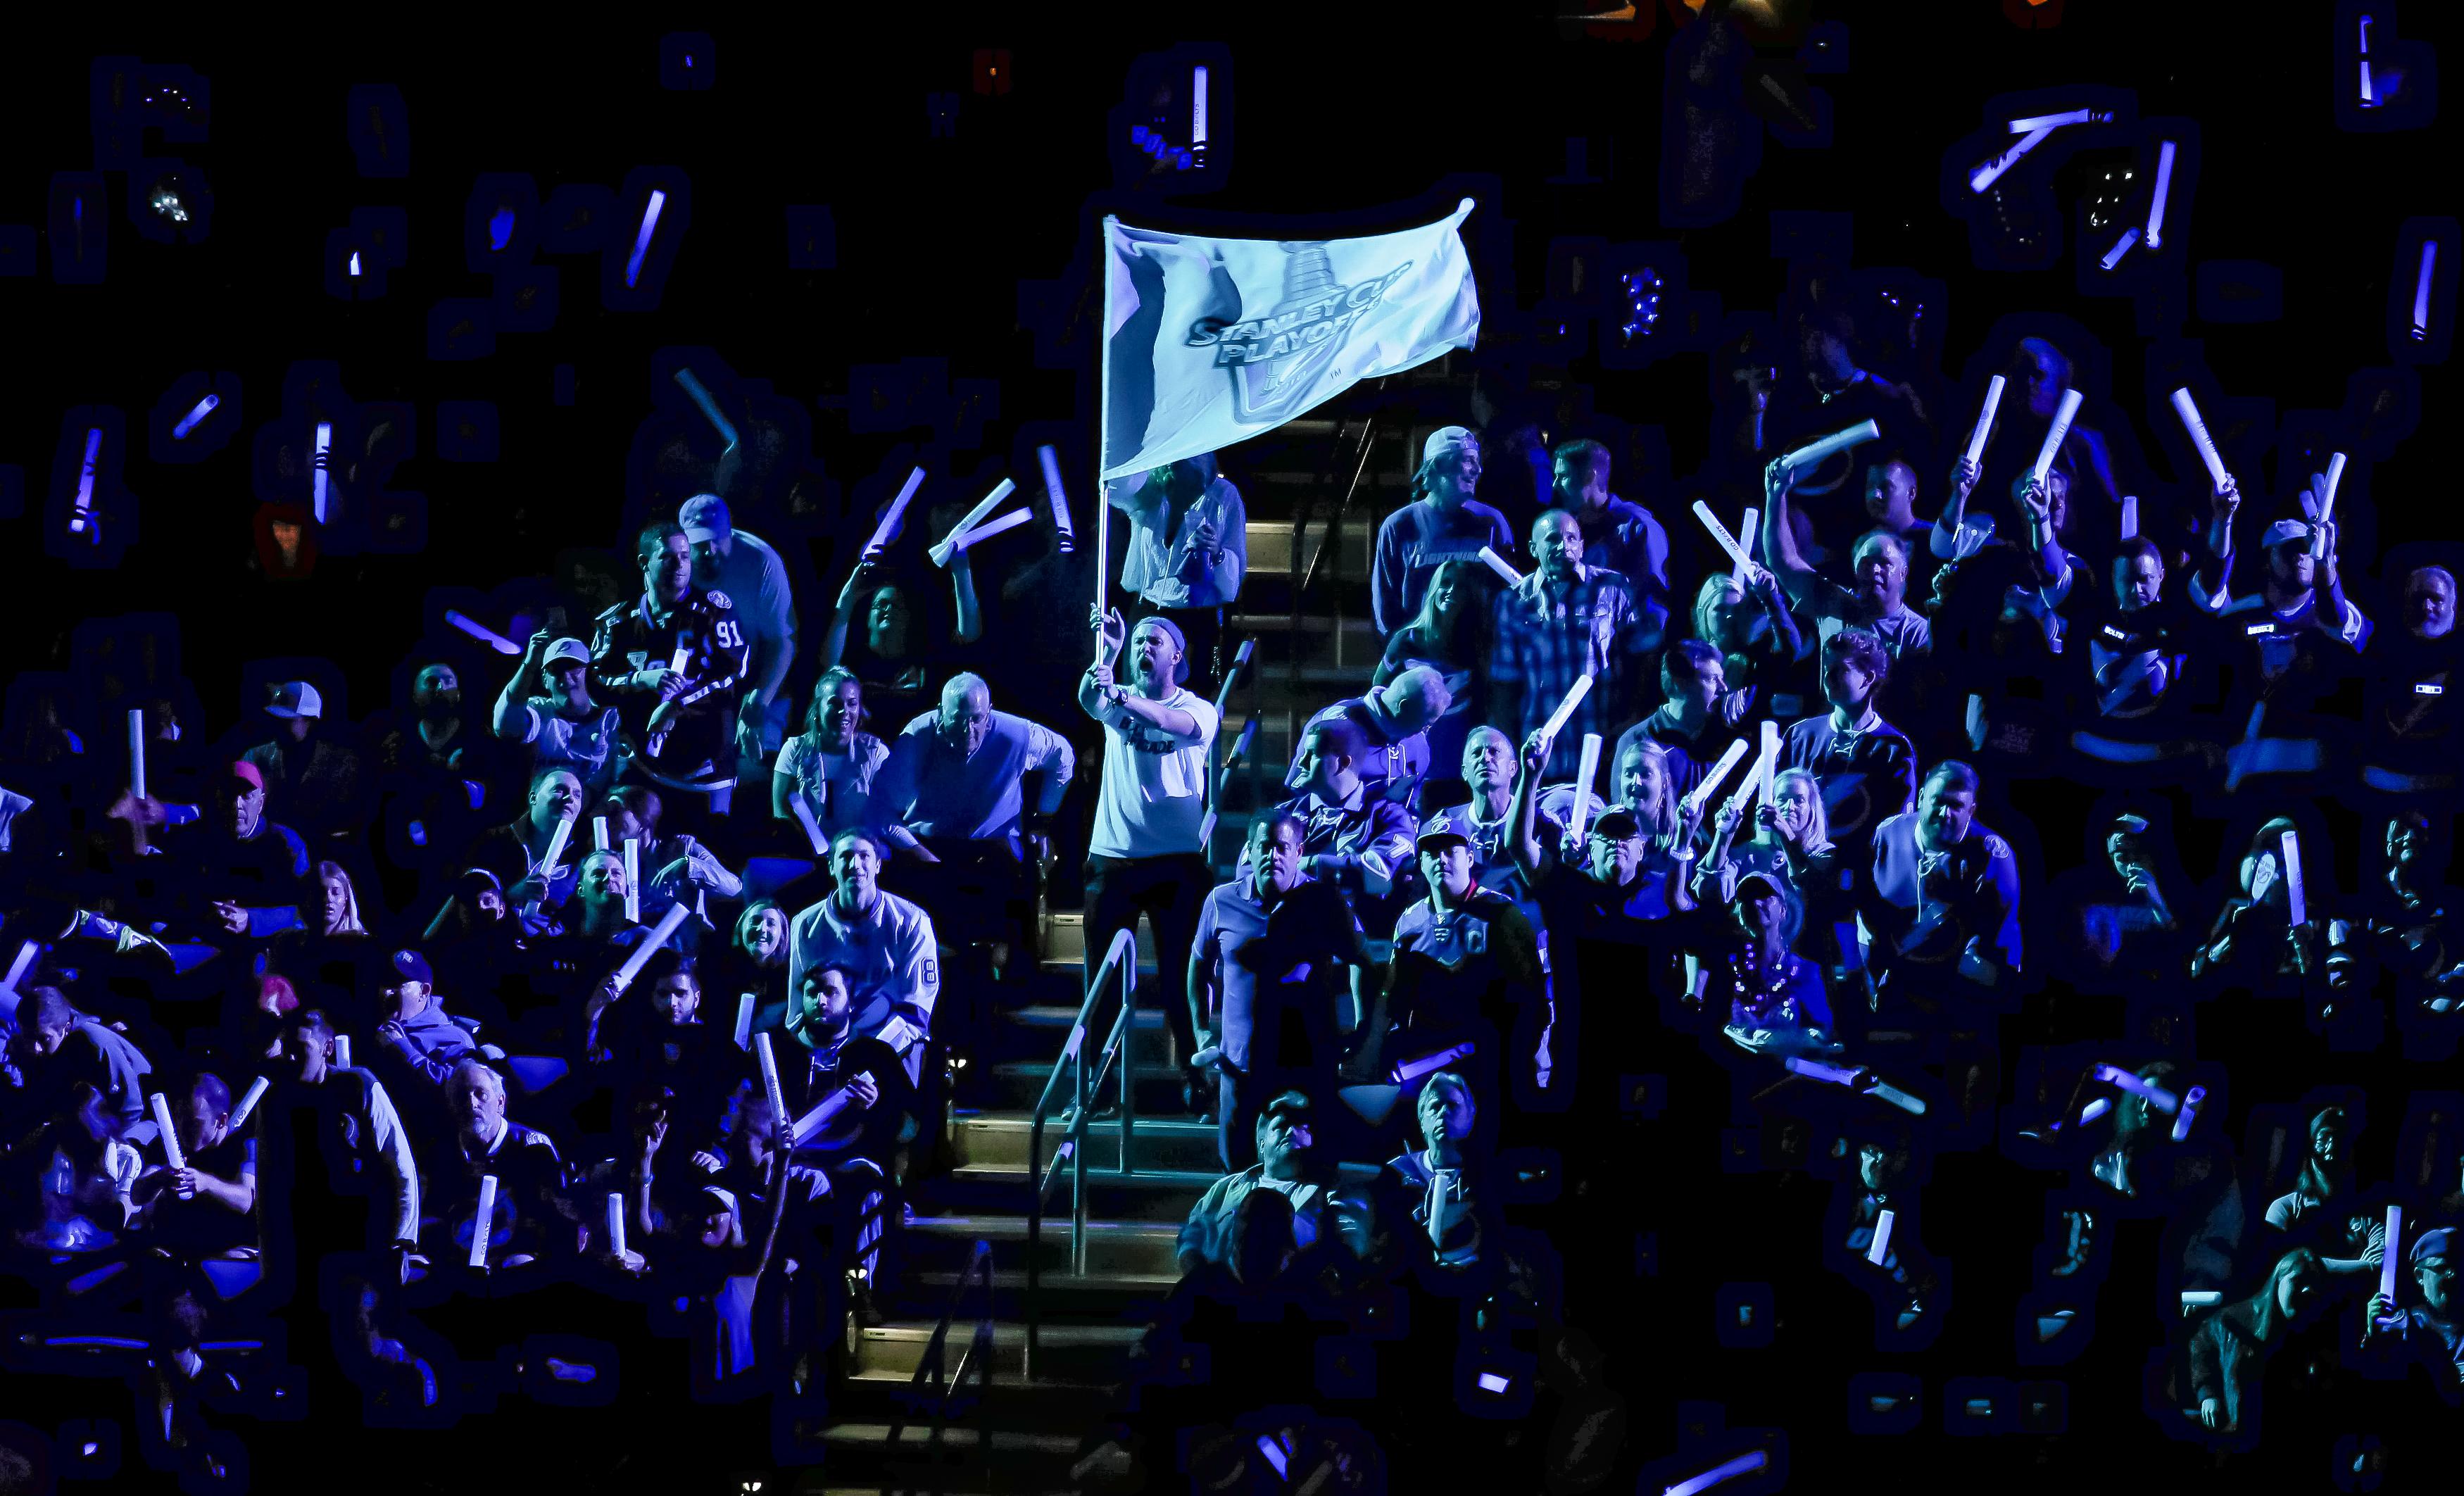 Washington Capitals v Tampa Bay Lightning - Game Five